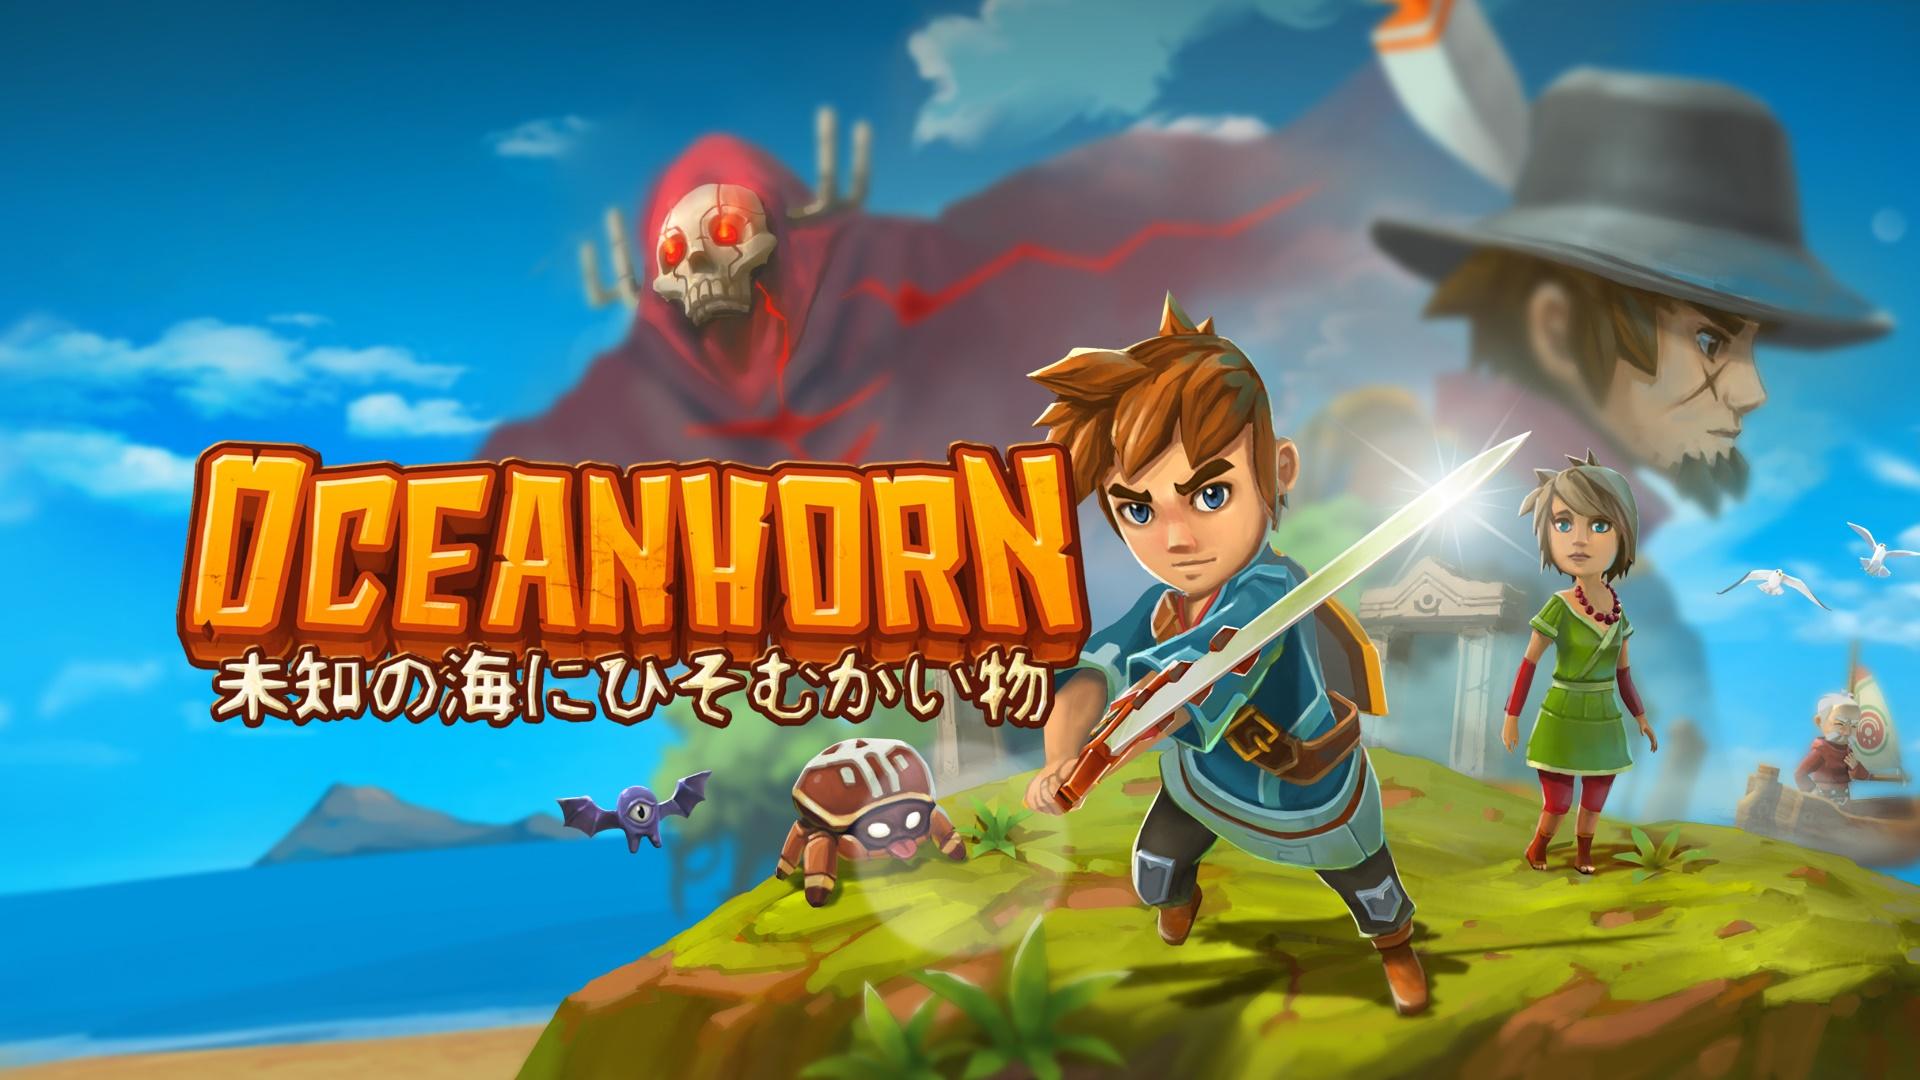 『Oceanhorn』や『Wonder Boy』はNintendo Switch版が一番売れる